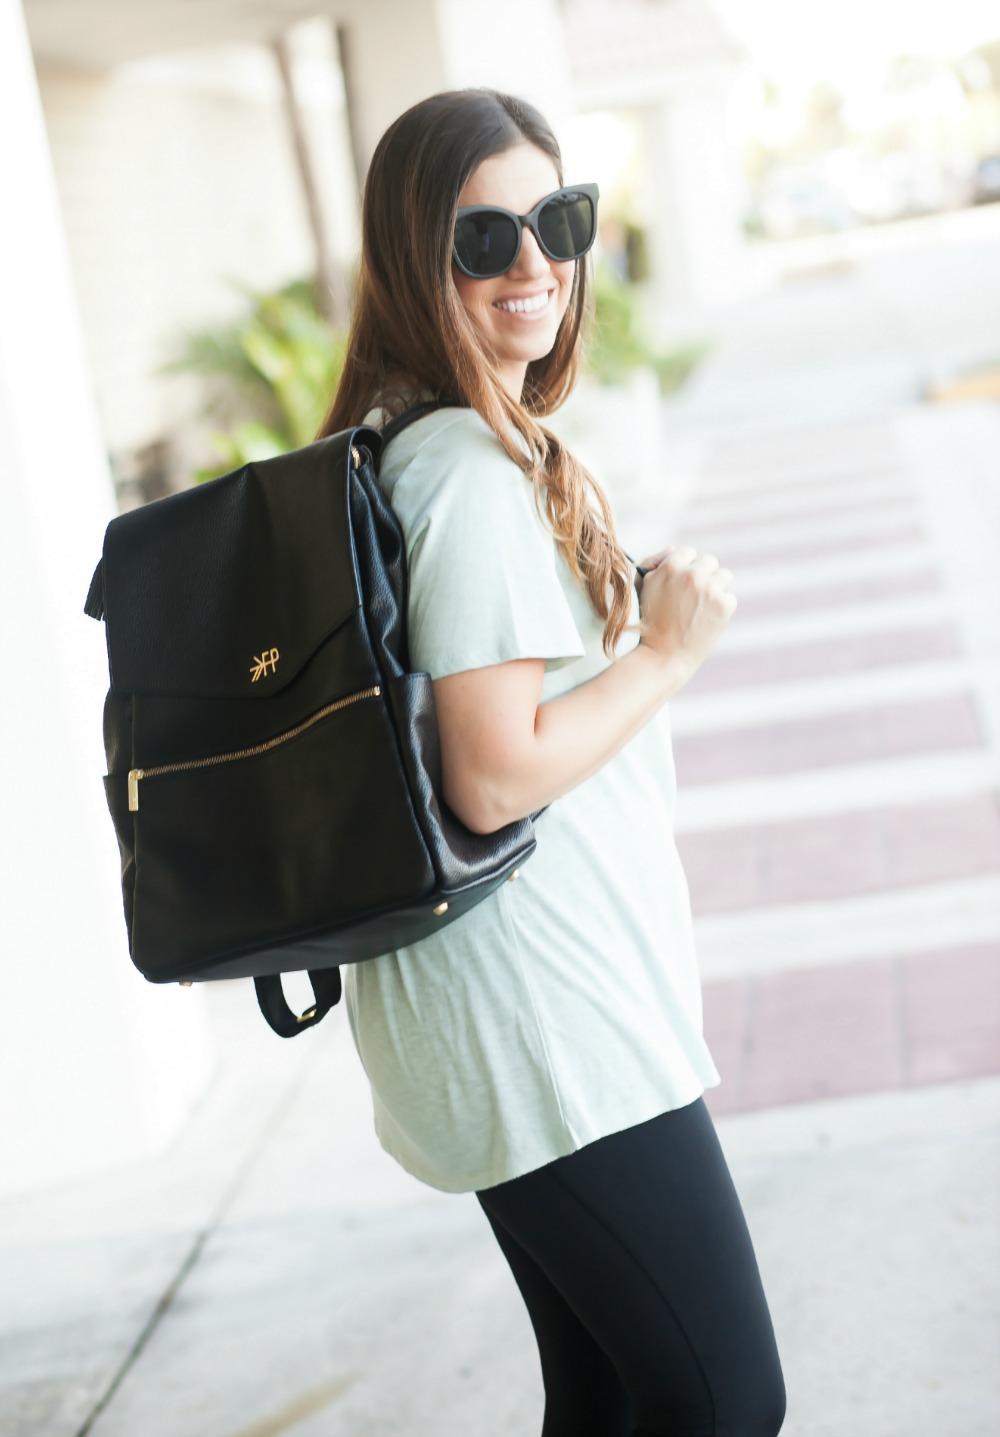 Lace-Up Tee Shirt _ Freshly Picked Diaper Bag _ Backpack Diaper Bag _ Black Quay Sunglasses